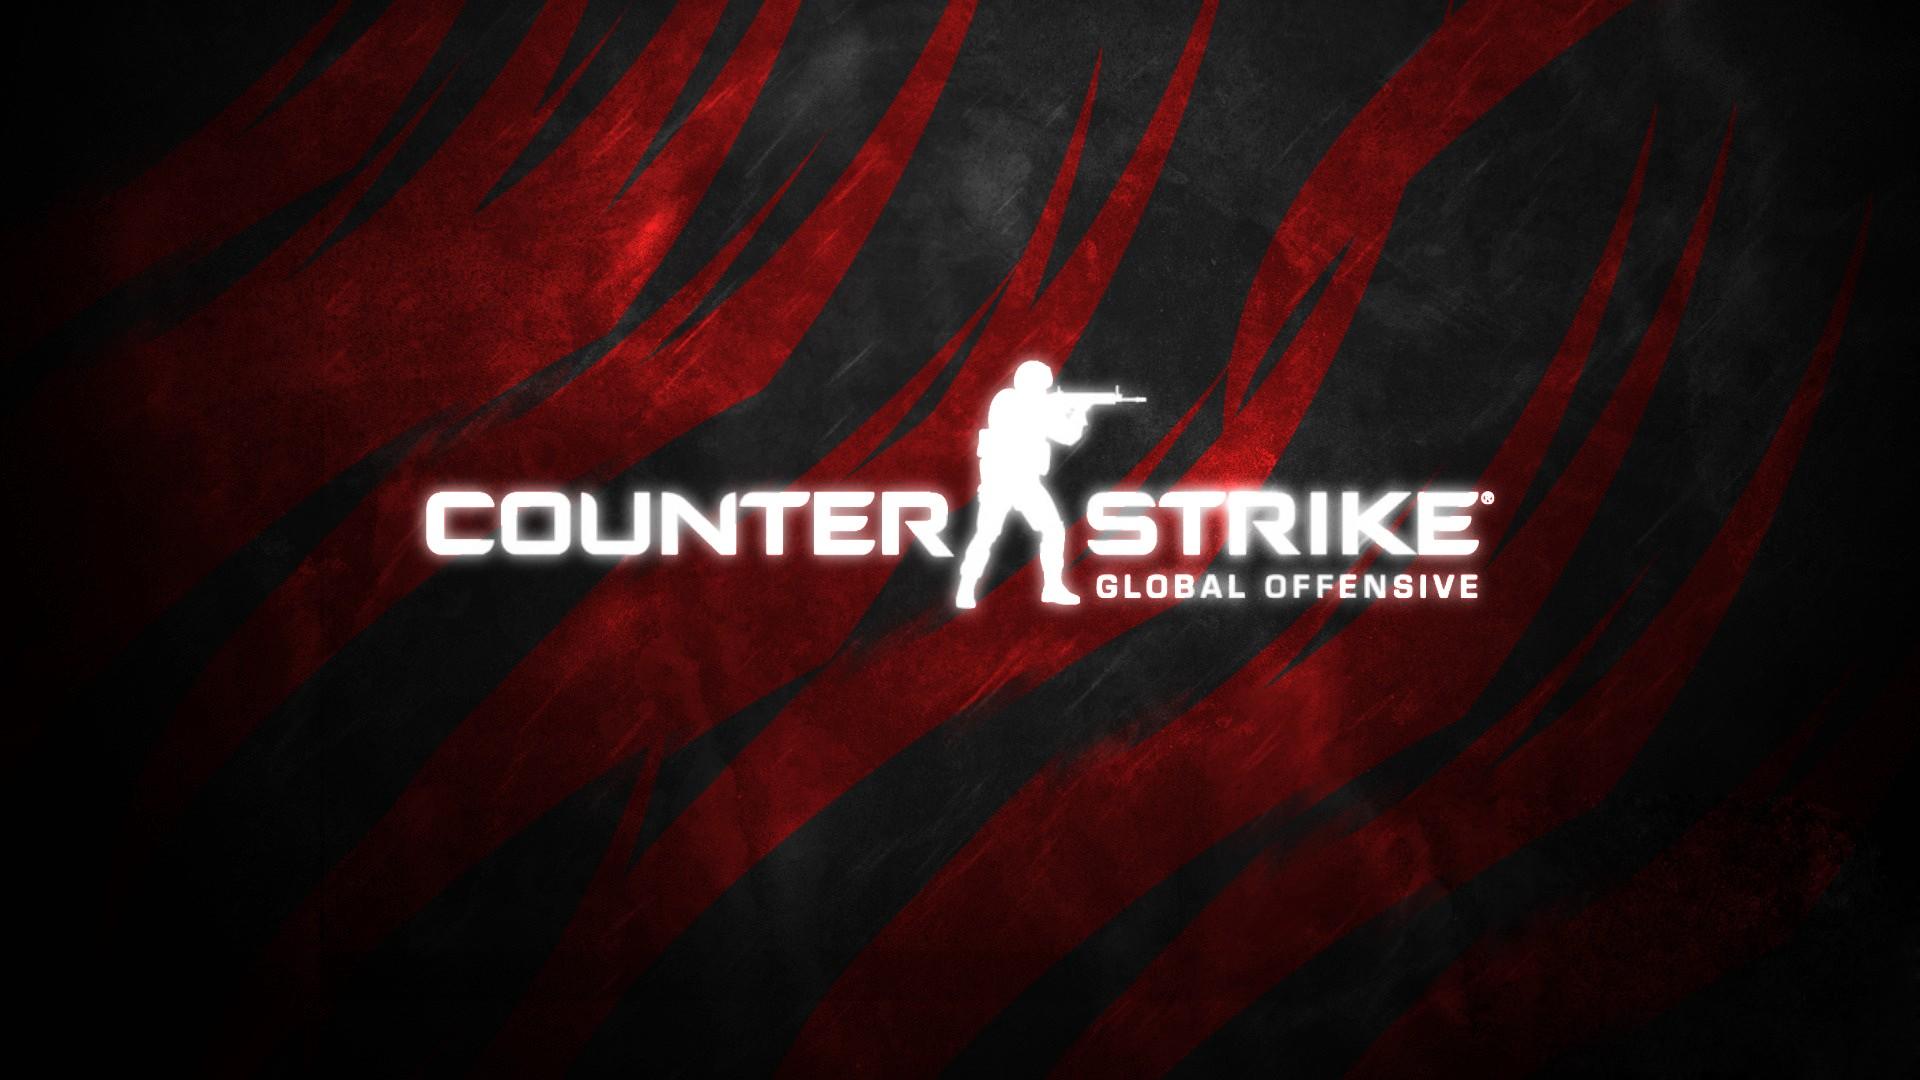 Counter Strike Global Offensive Hd Duvar Kağıdı Arka Plan